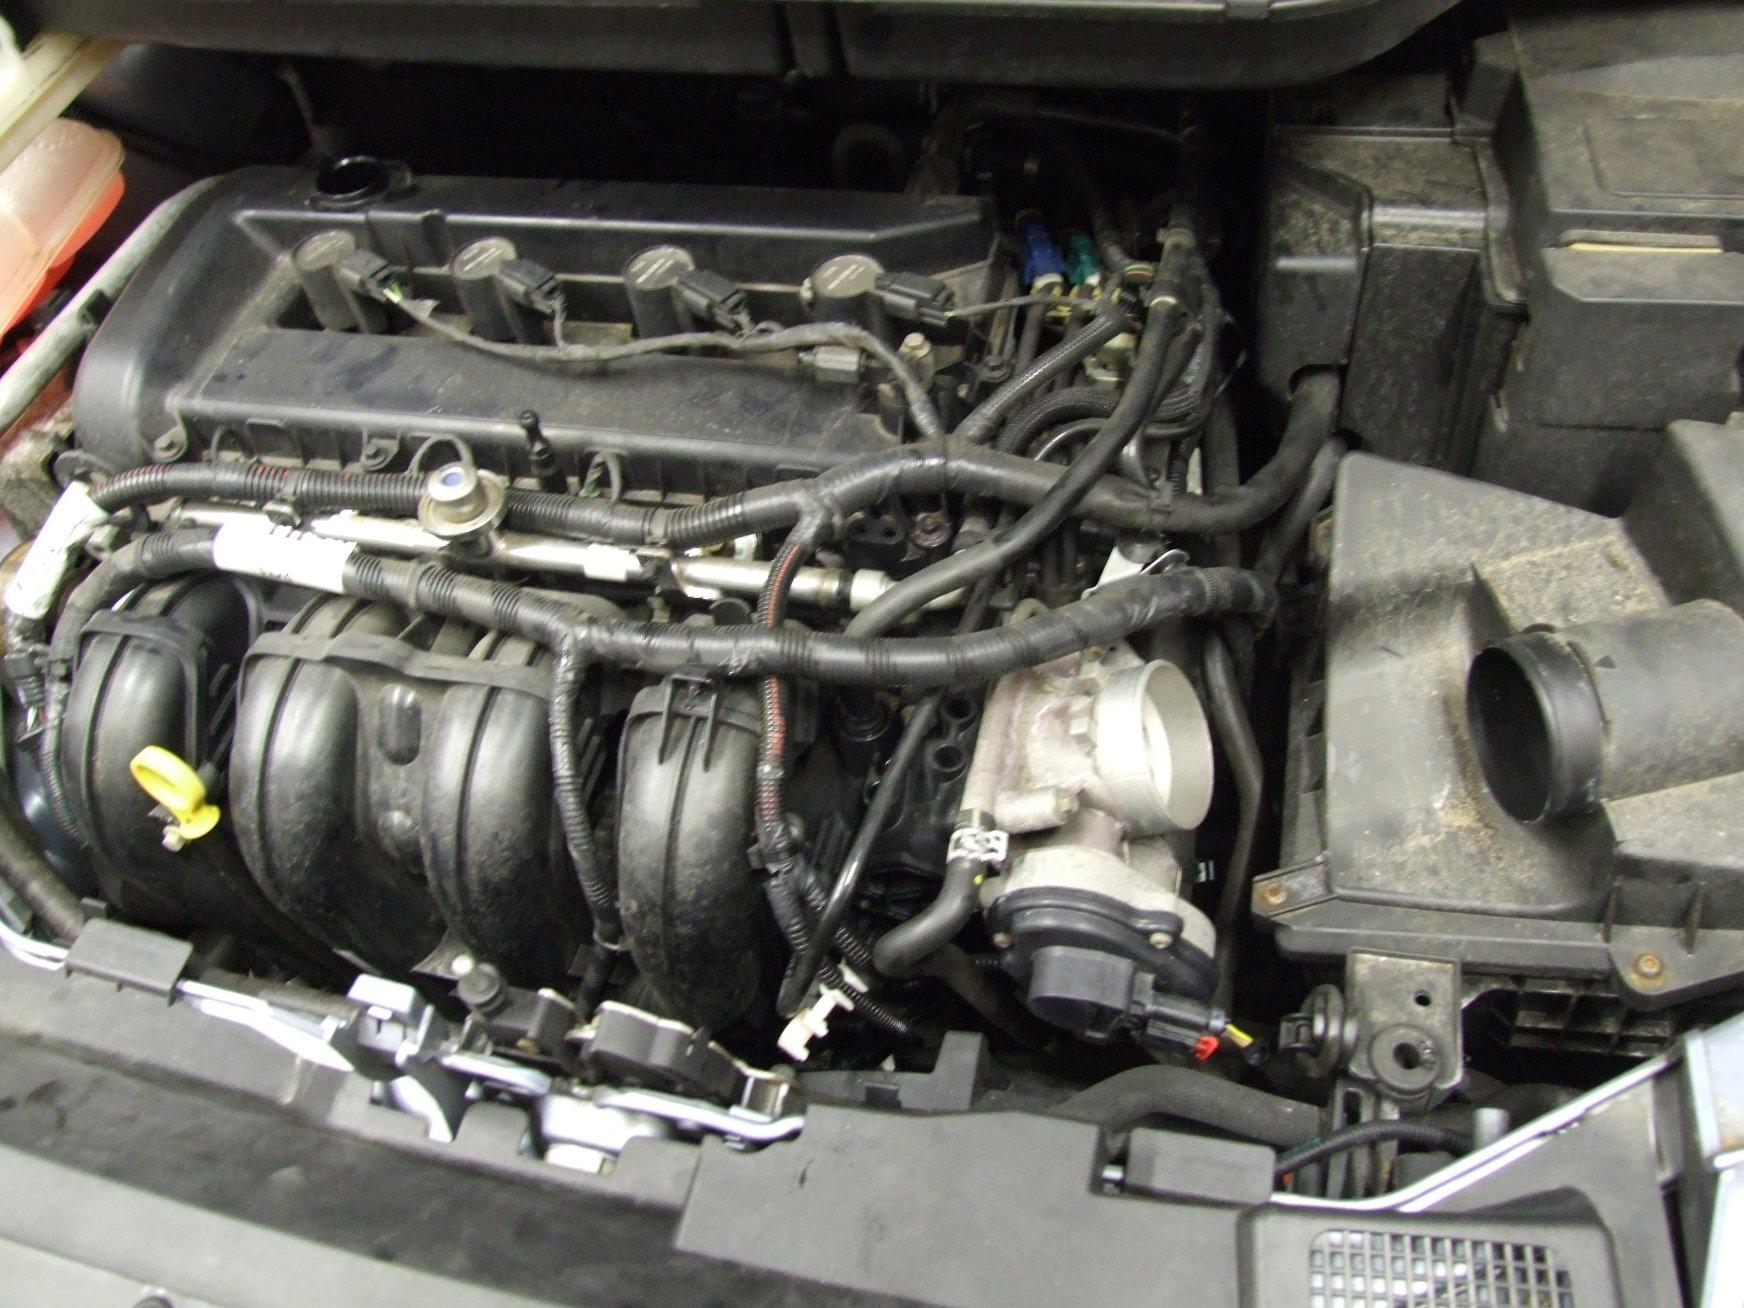 Ford Focus 2006 Zx3 S Engine Sensor Location Diagram